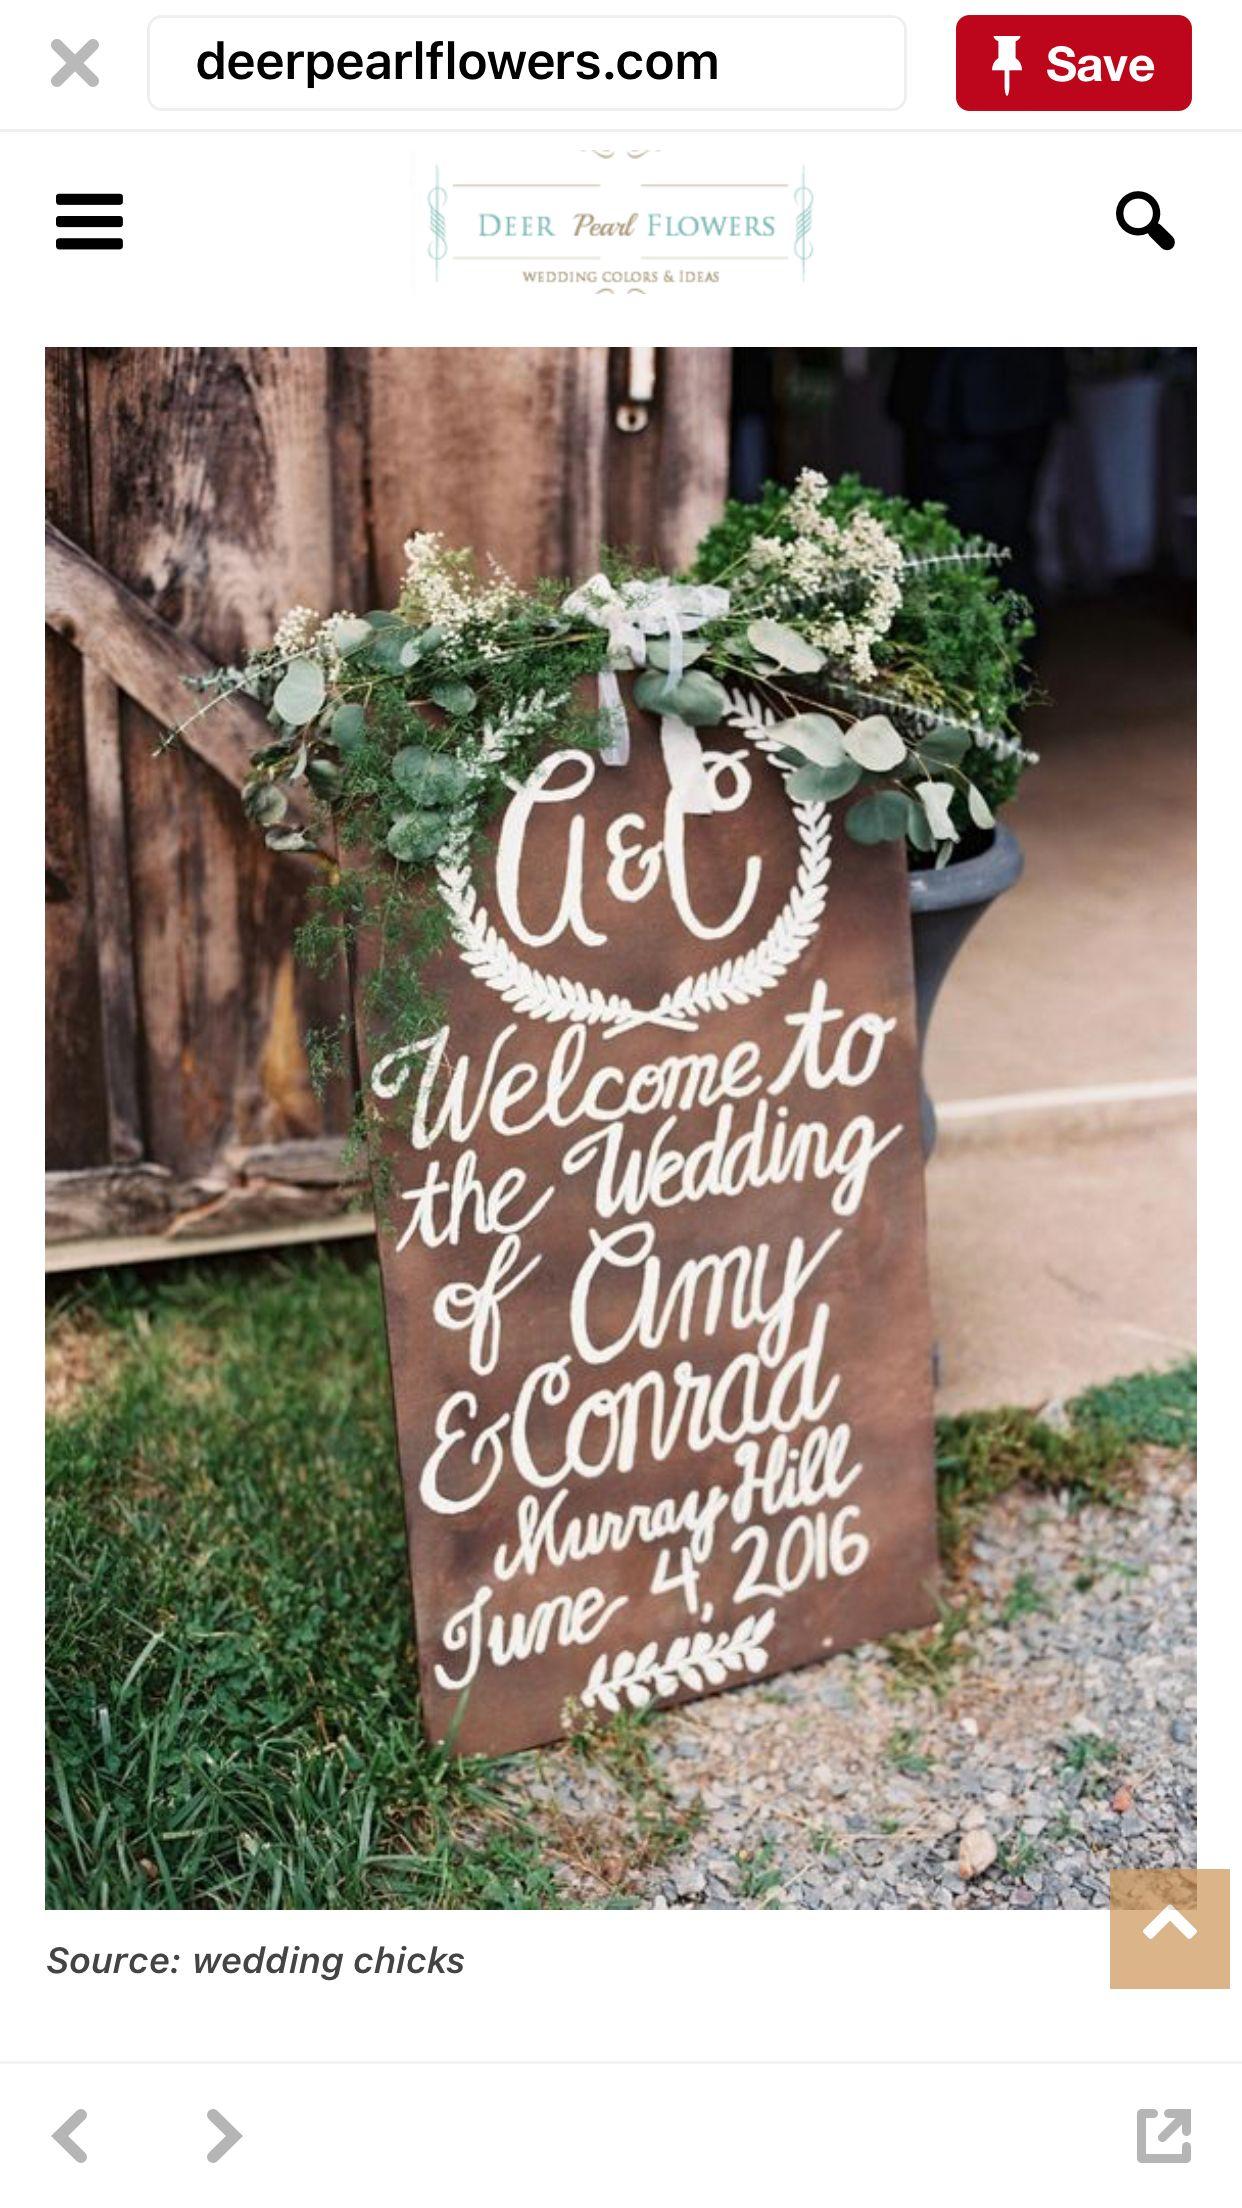 Pin by Crystal on Wedding Signage | Wedding signage, Chic